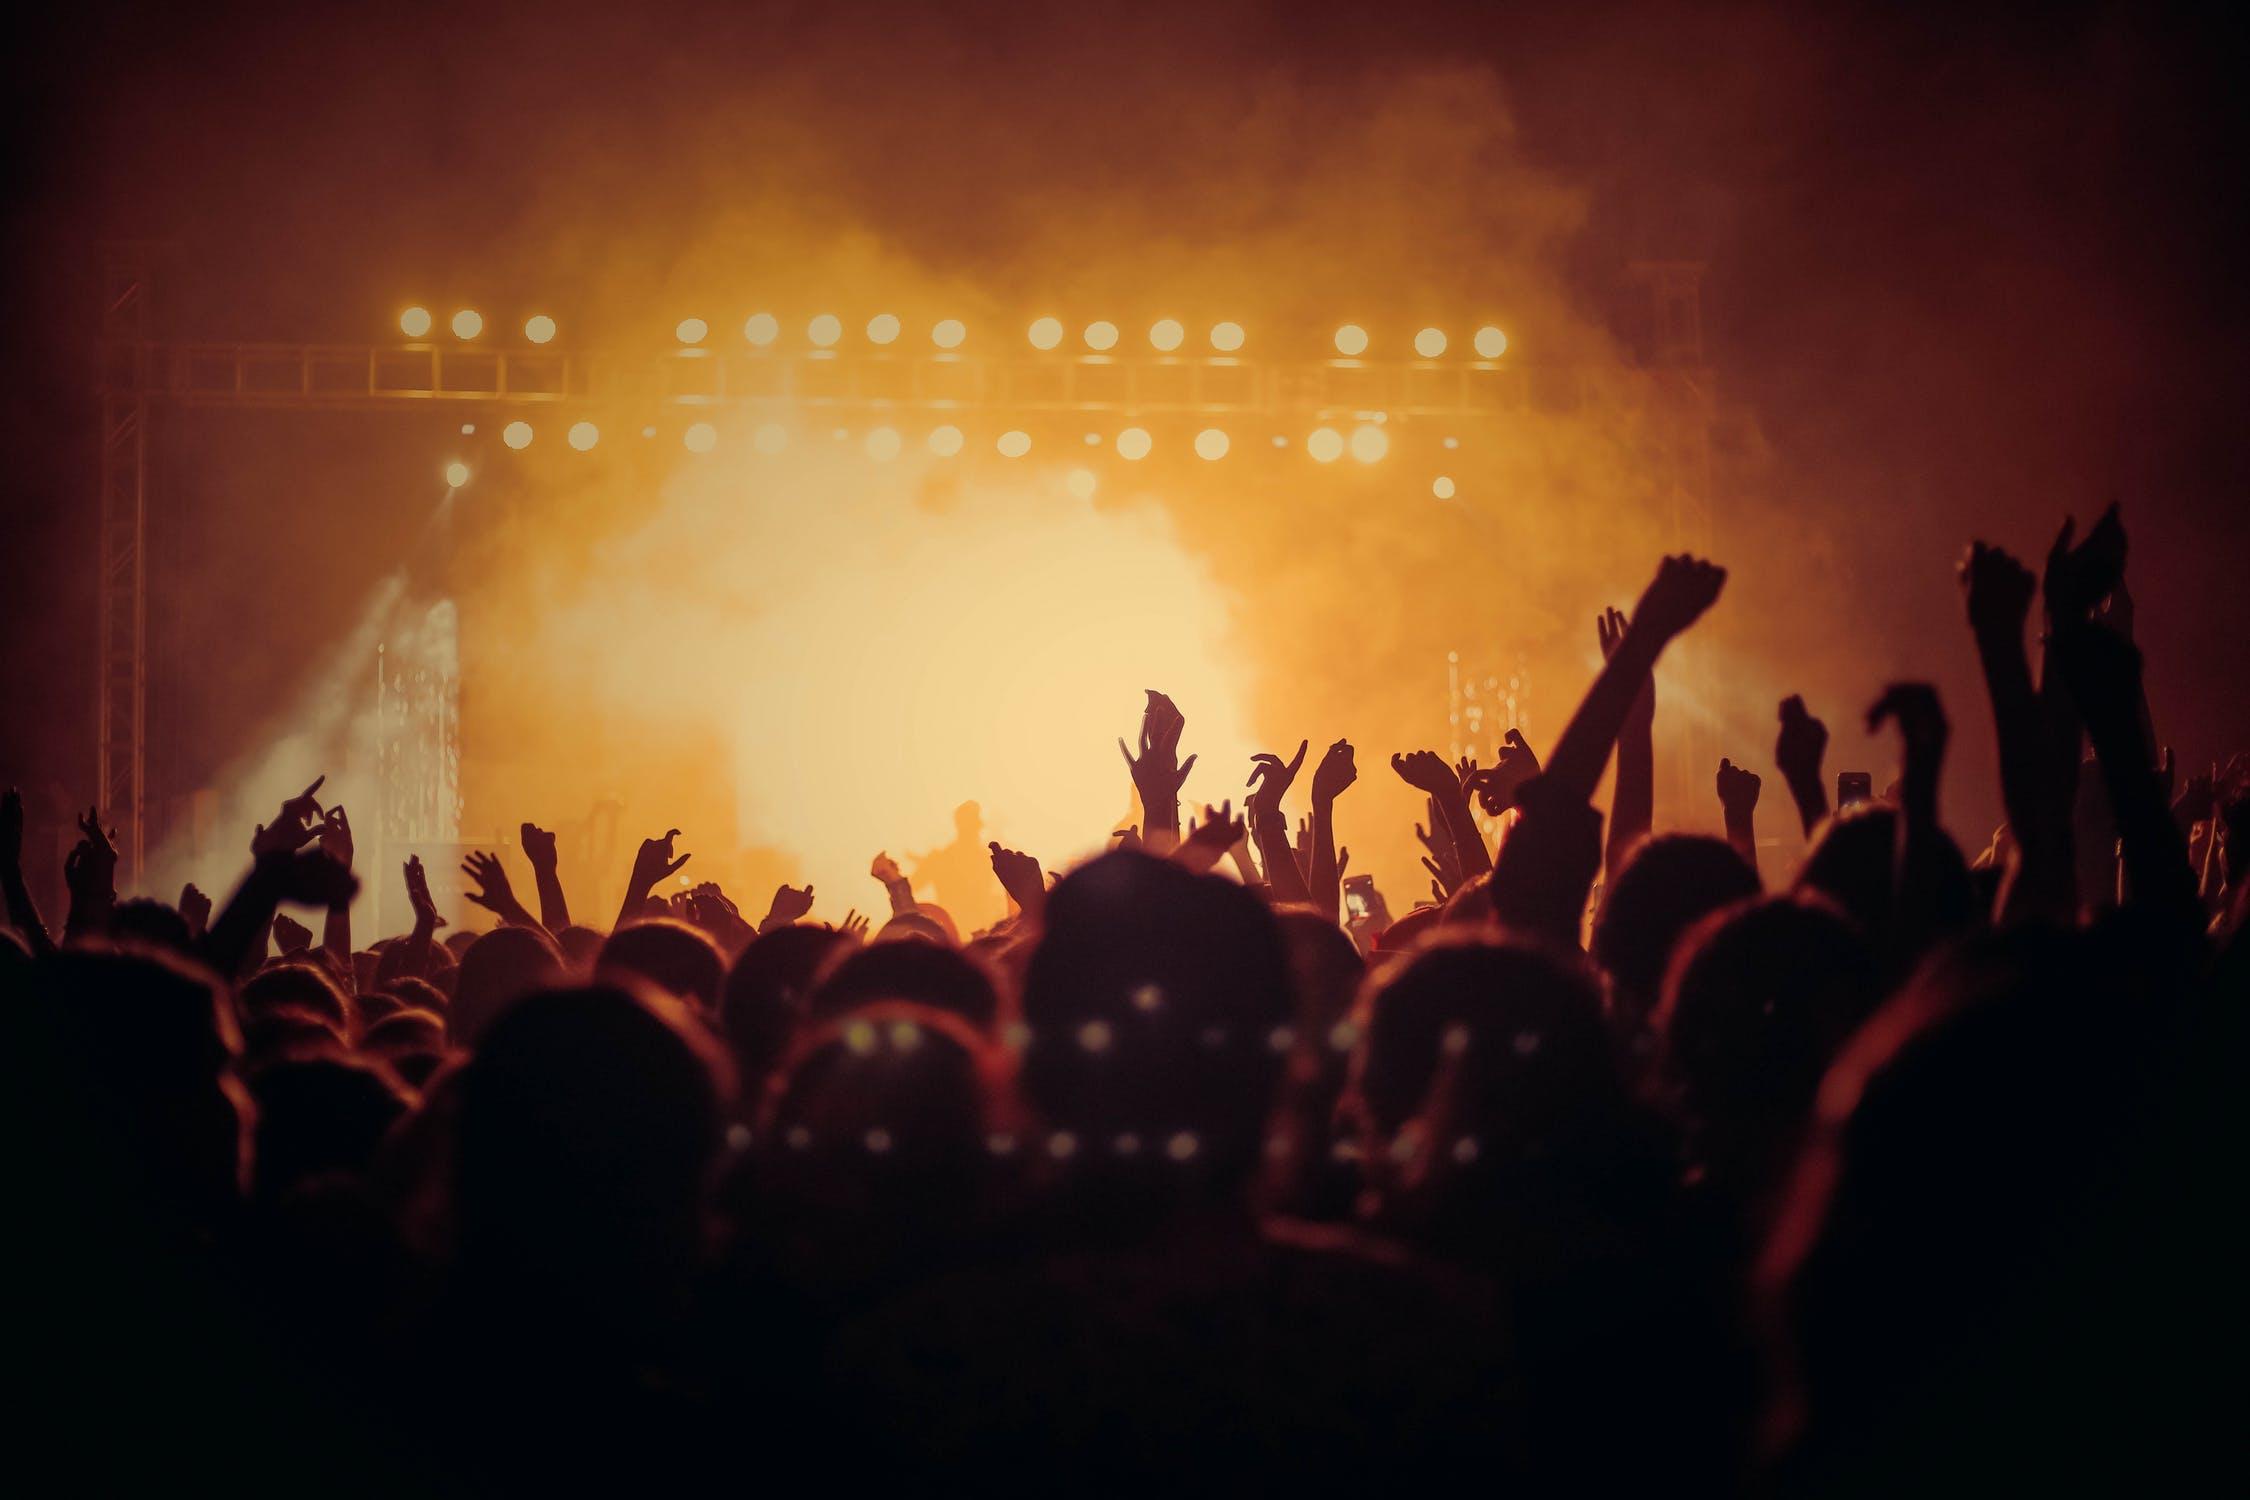 Quotes for Music Festivals